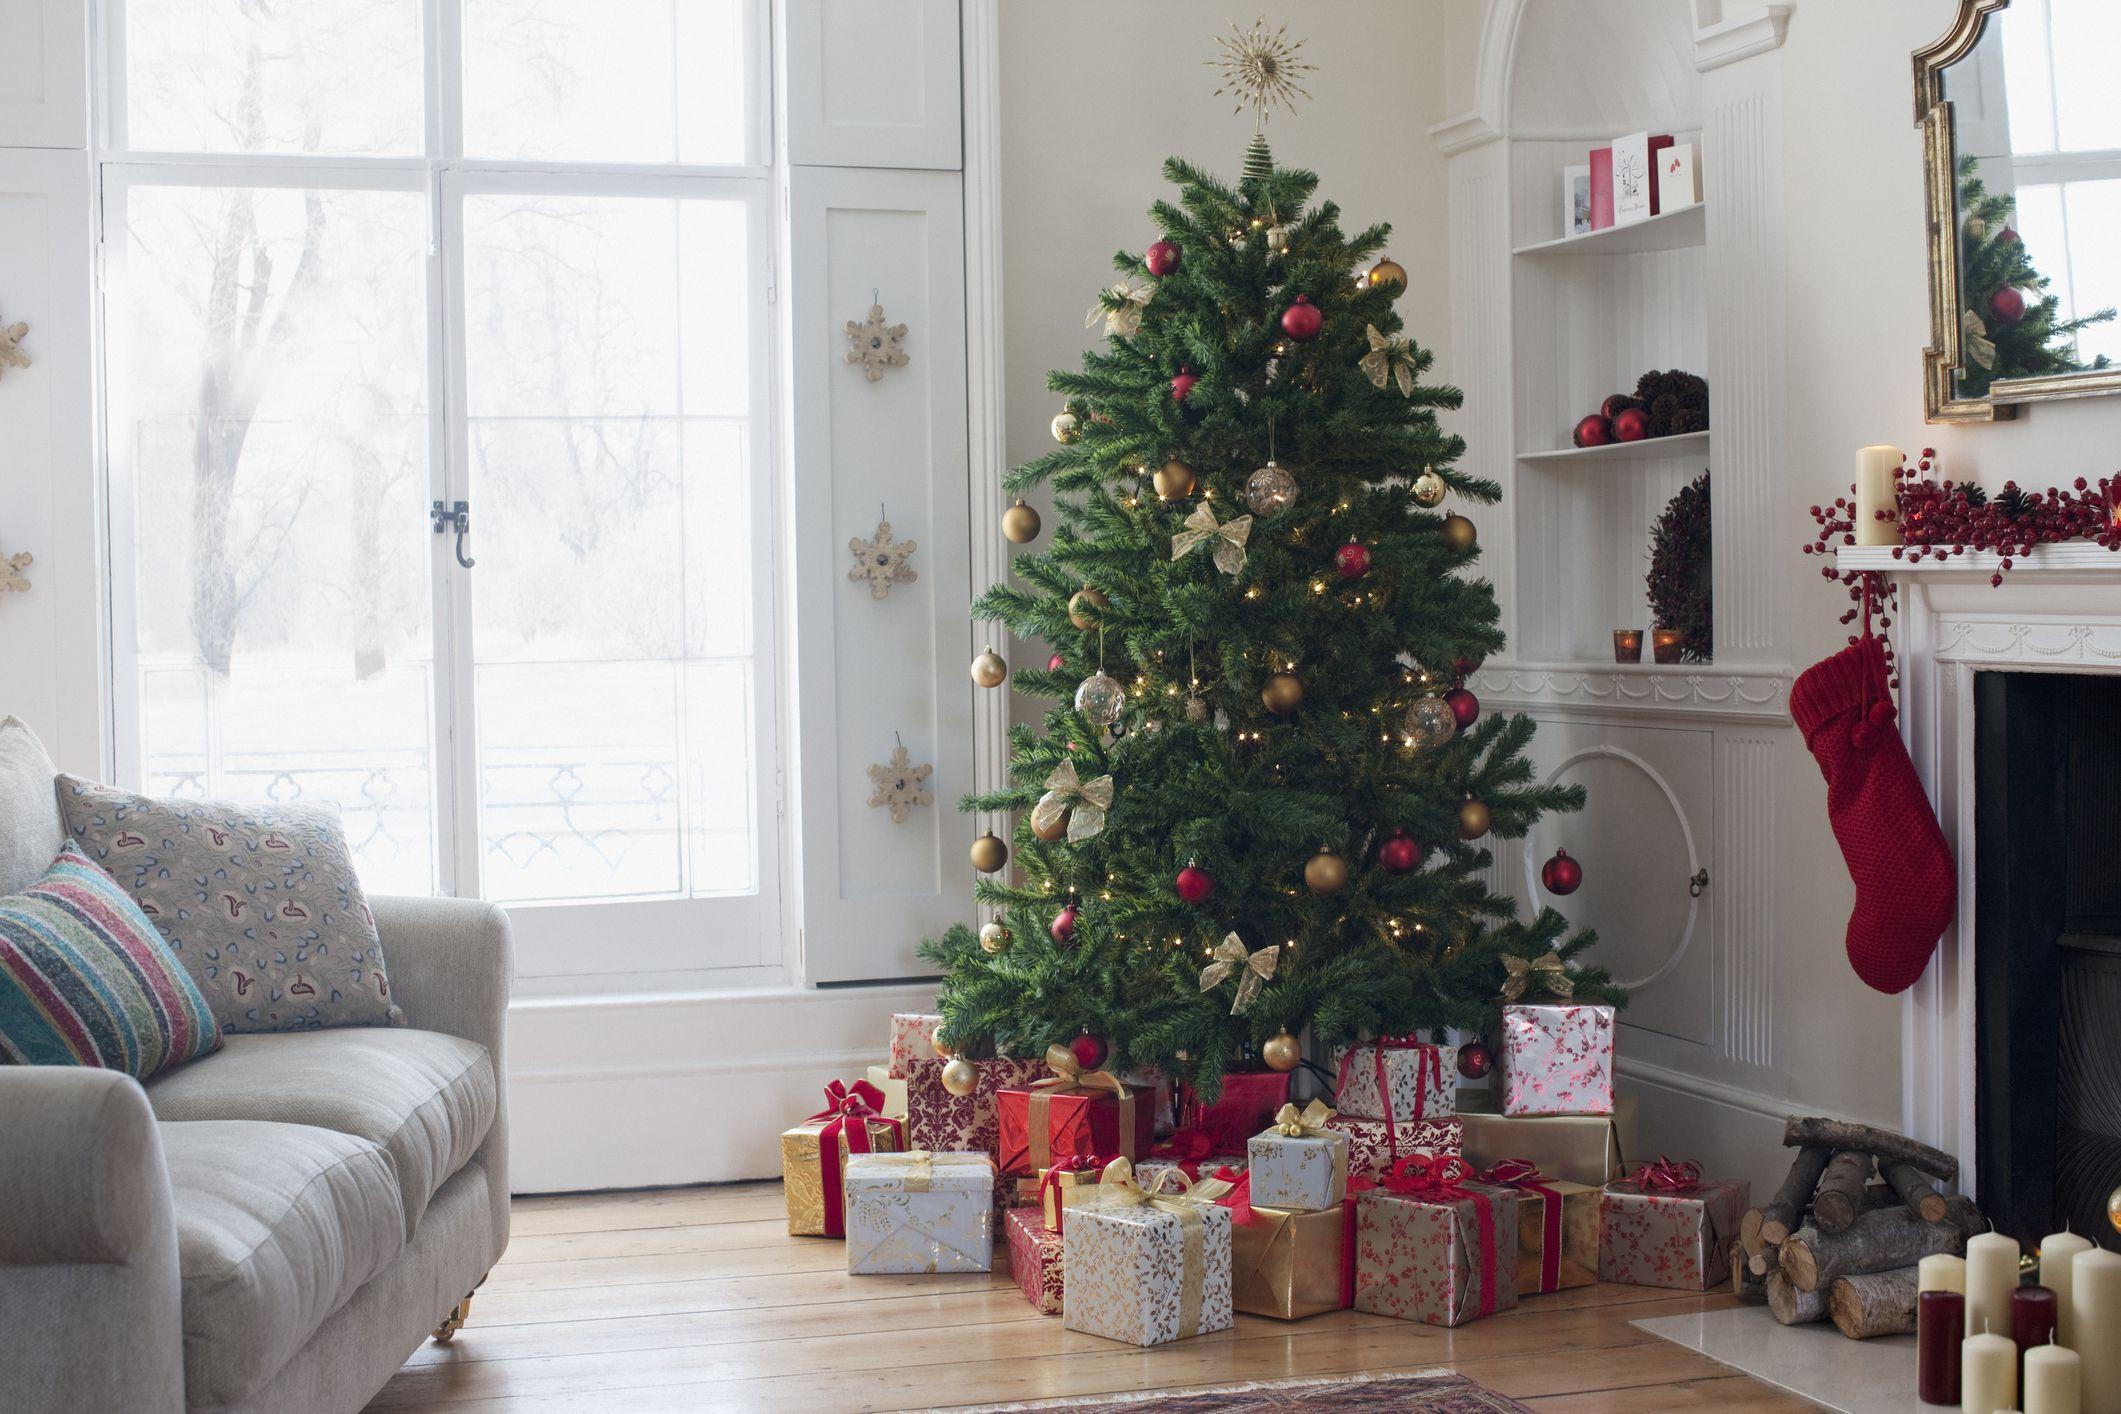 31 Reasons to Celebrate in December